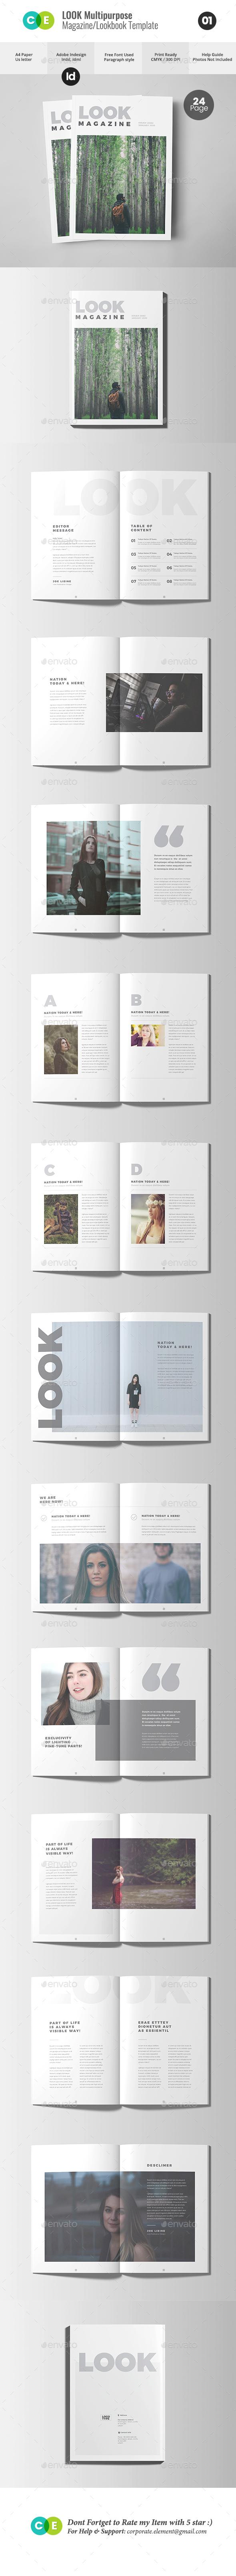 Look | The Magazine Lookbook V01 - Magazines Print Templates